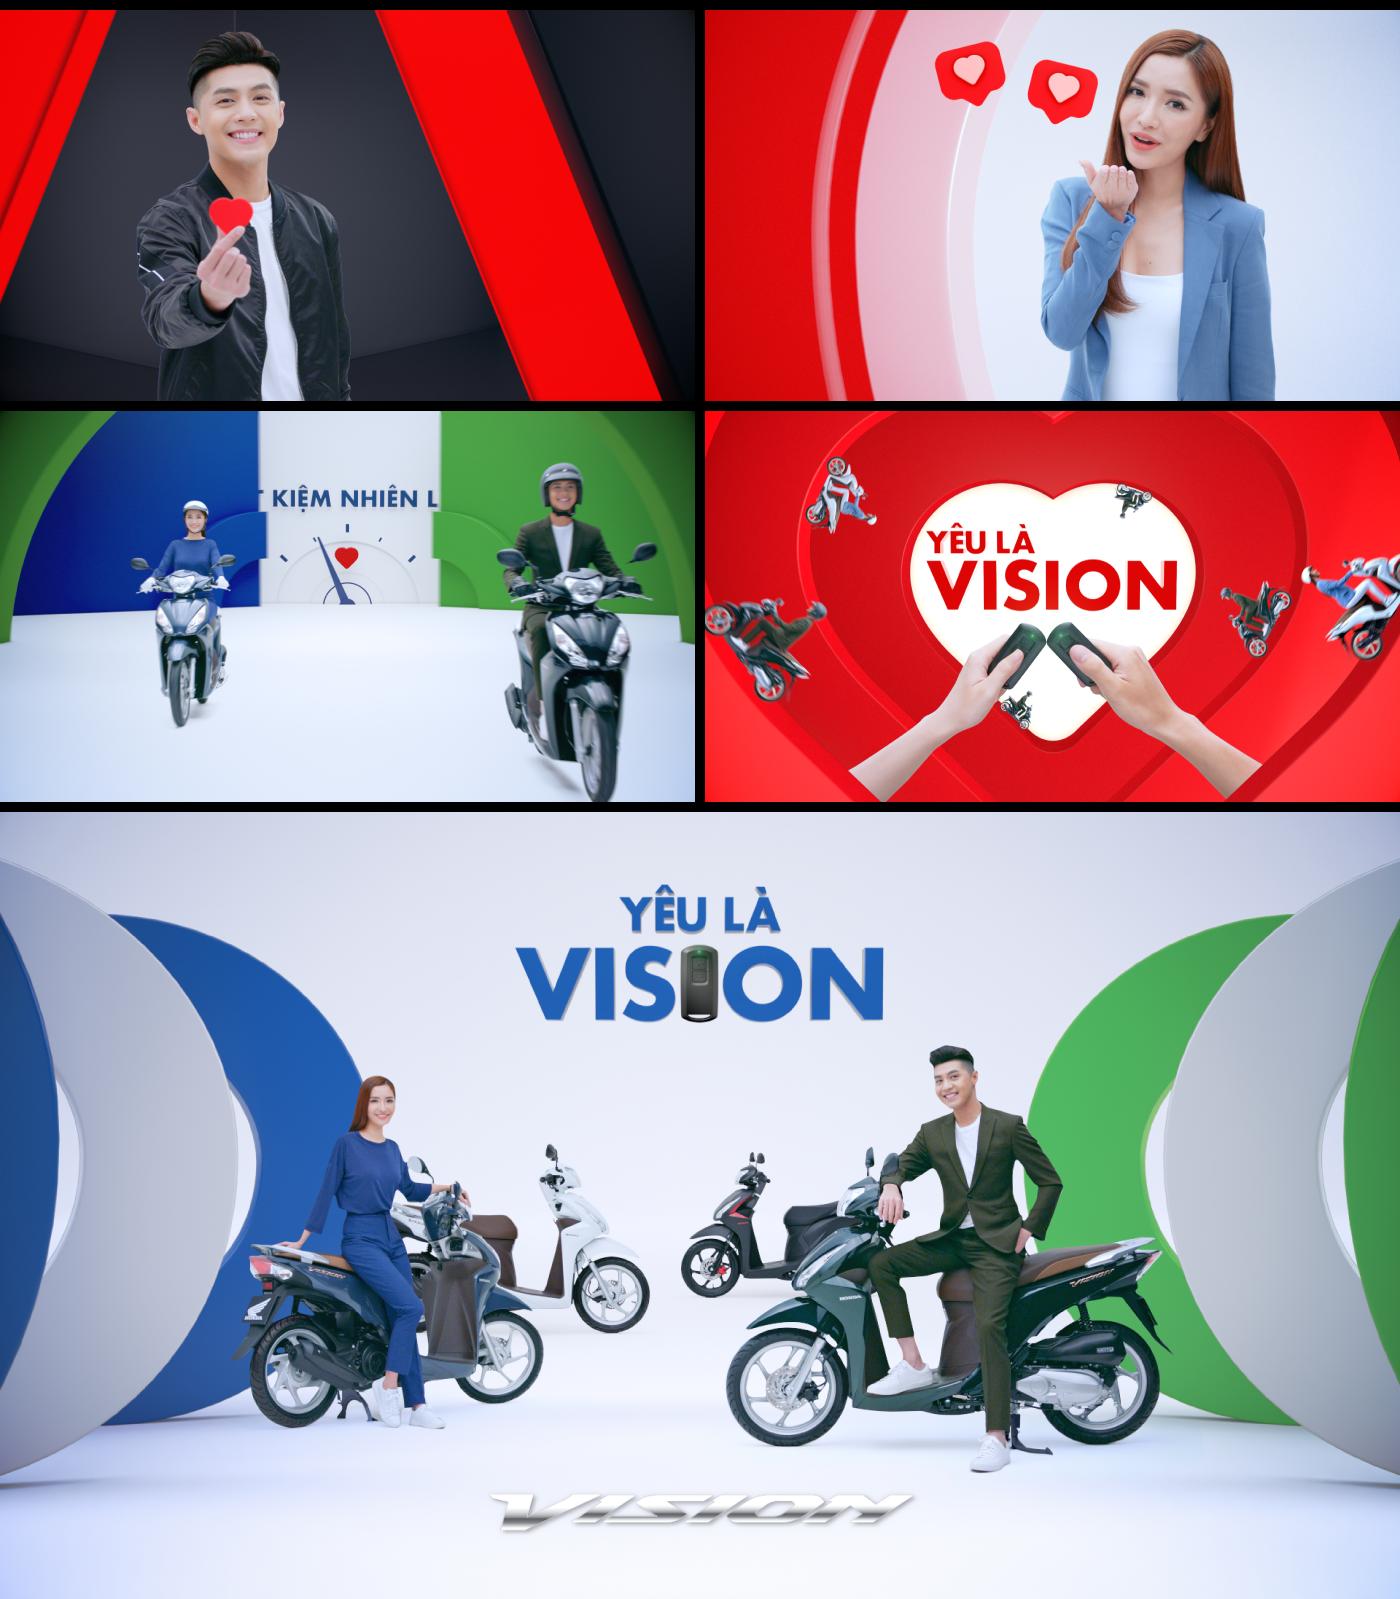 motorbike vitenam spain popstar vision CG 3D vfx live action post